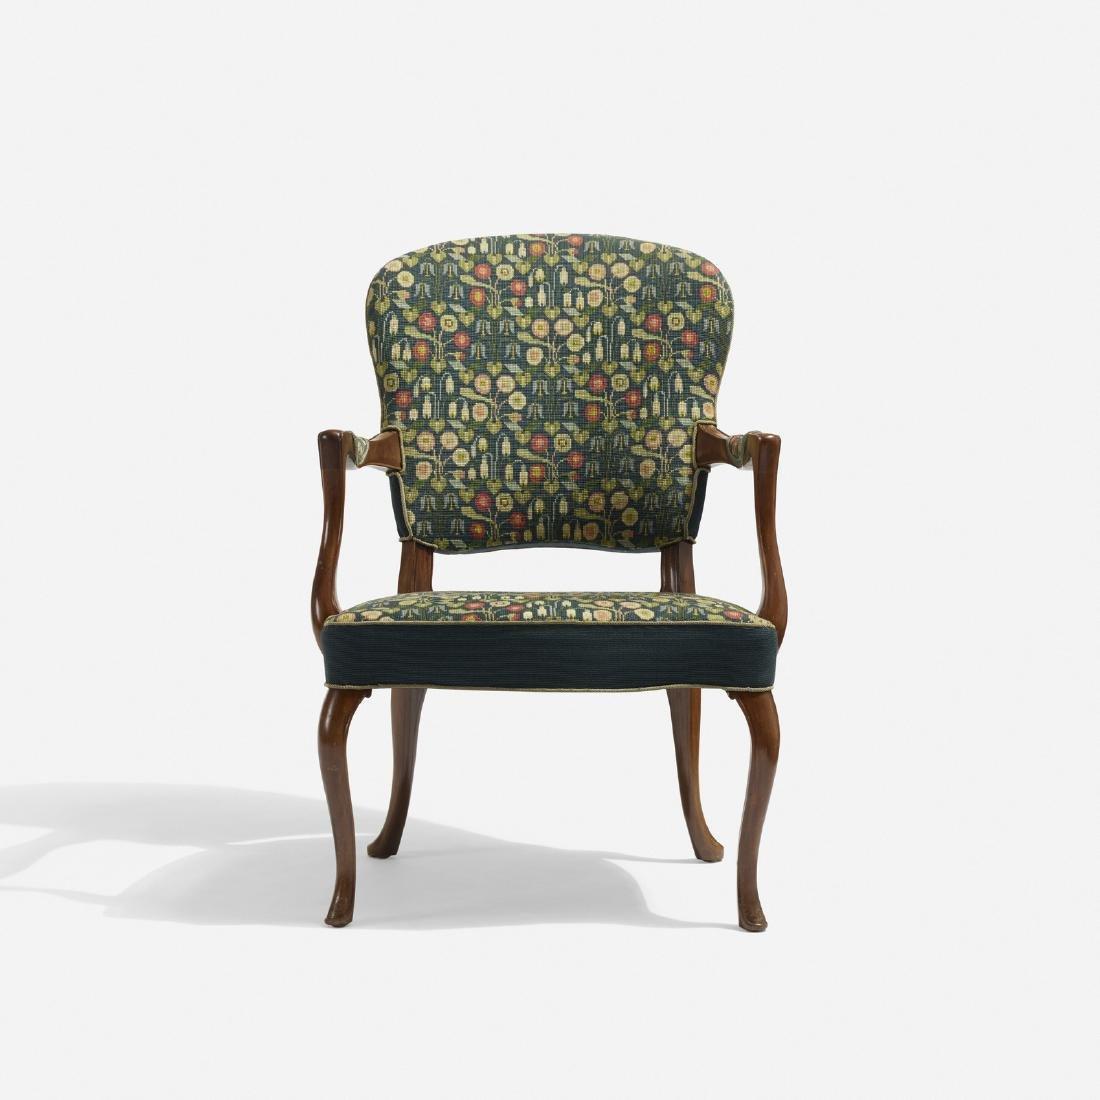 Frits Henningsen, armchair